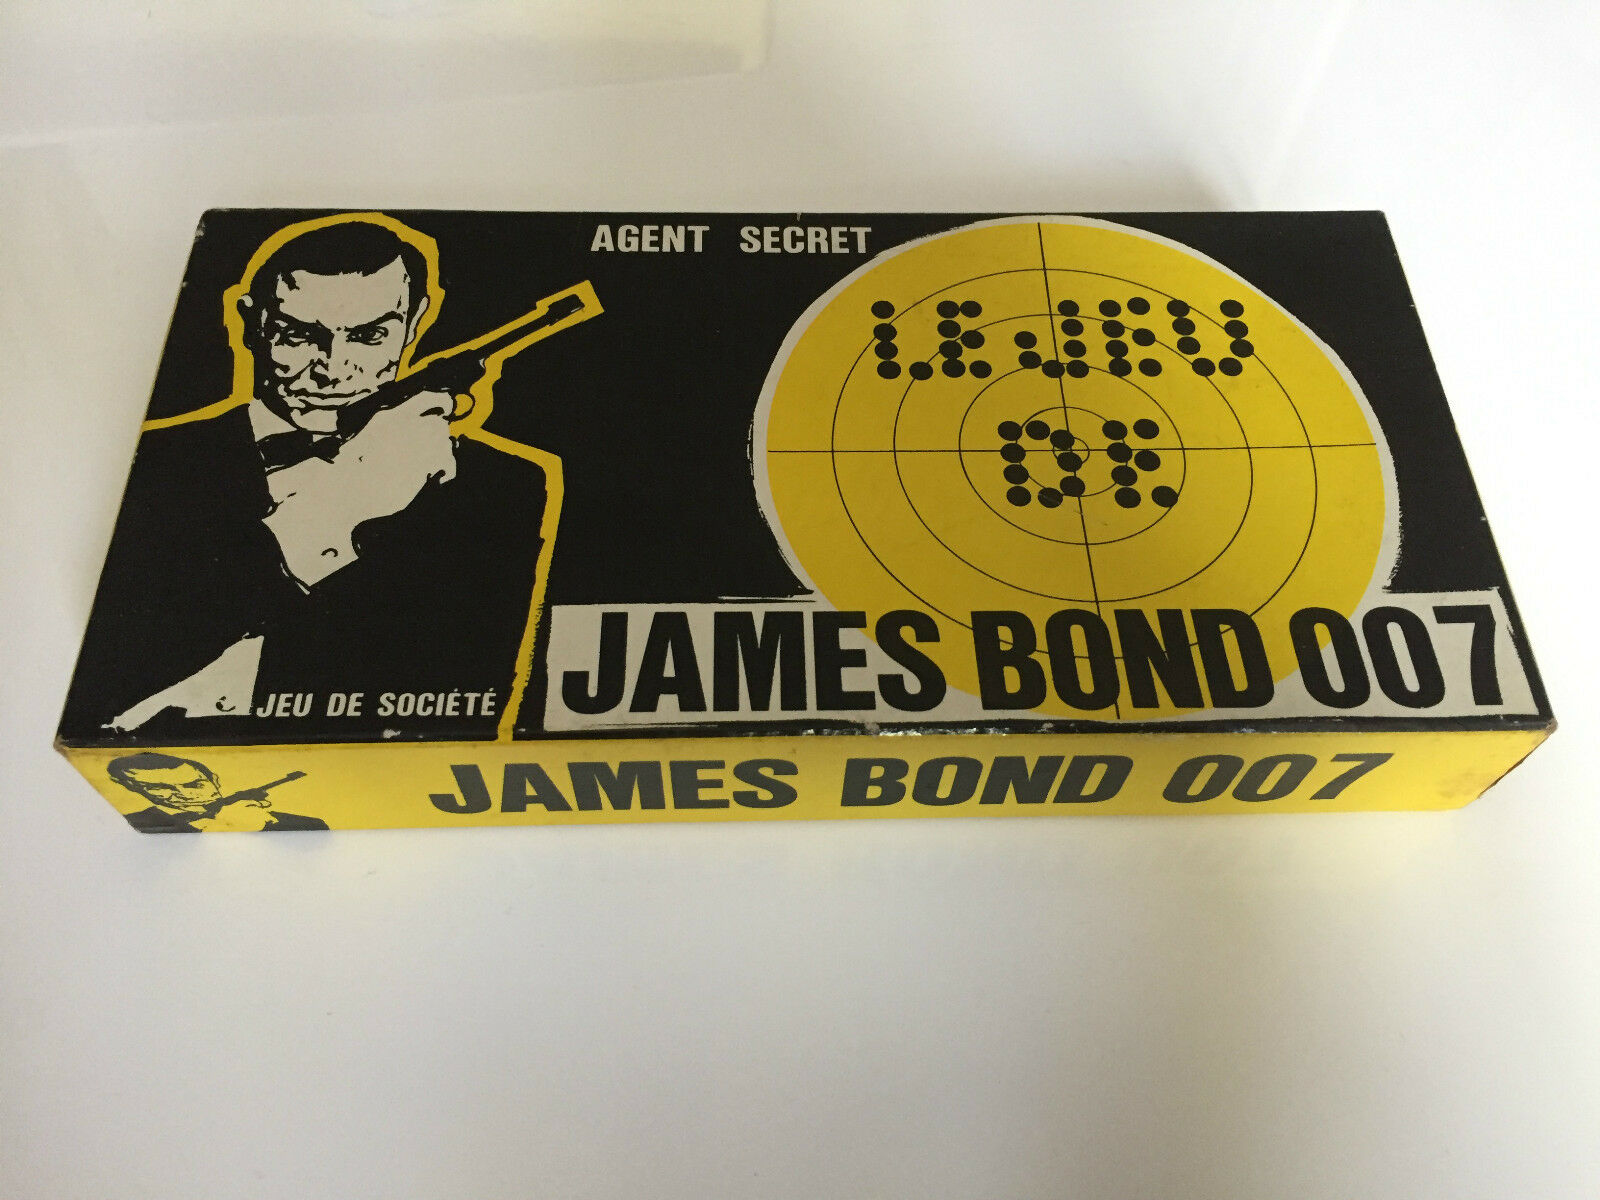 Jeu de société (board game) James Bond 007 - complet, état neuf